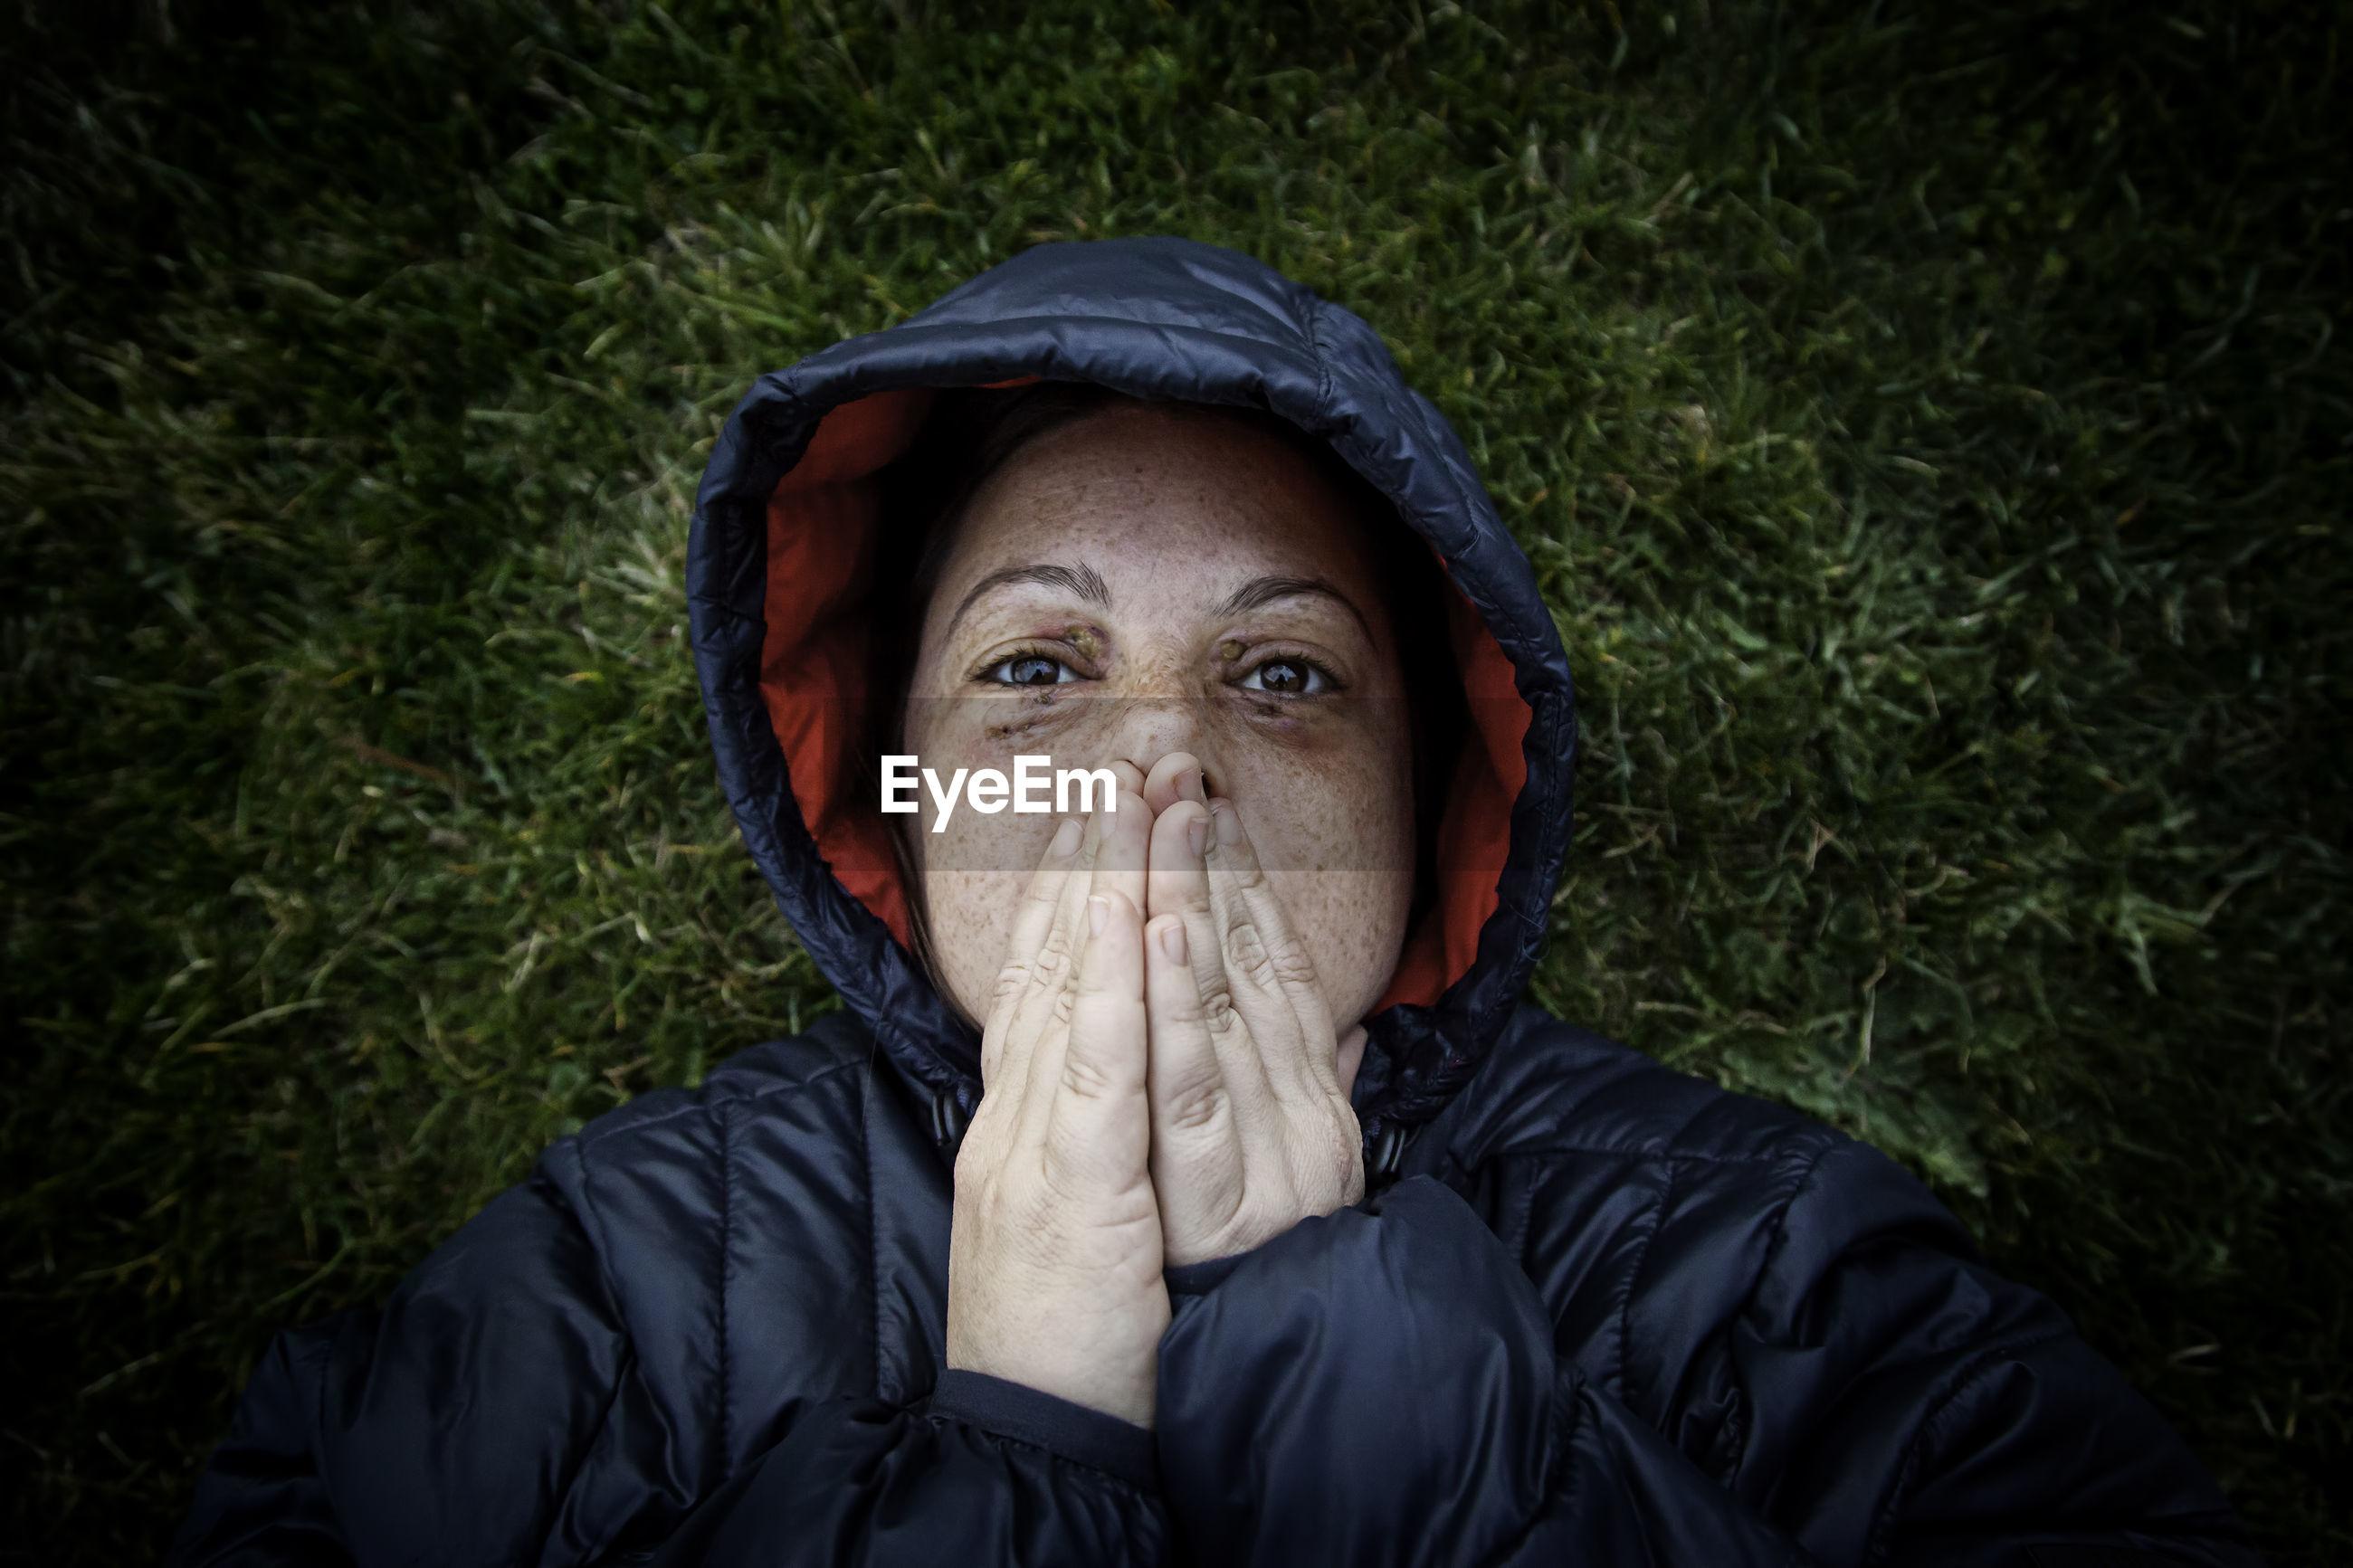 Portrait of woman wearing warm clothing on grassy field